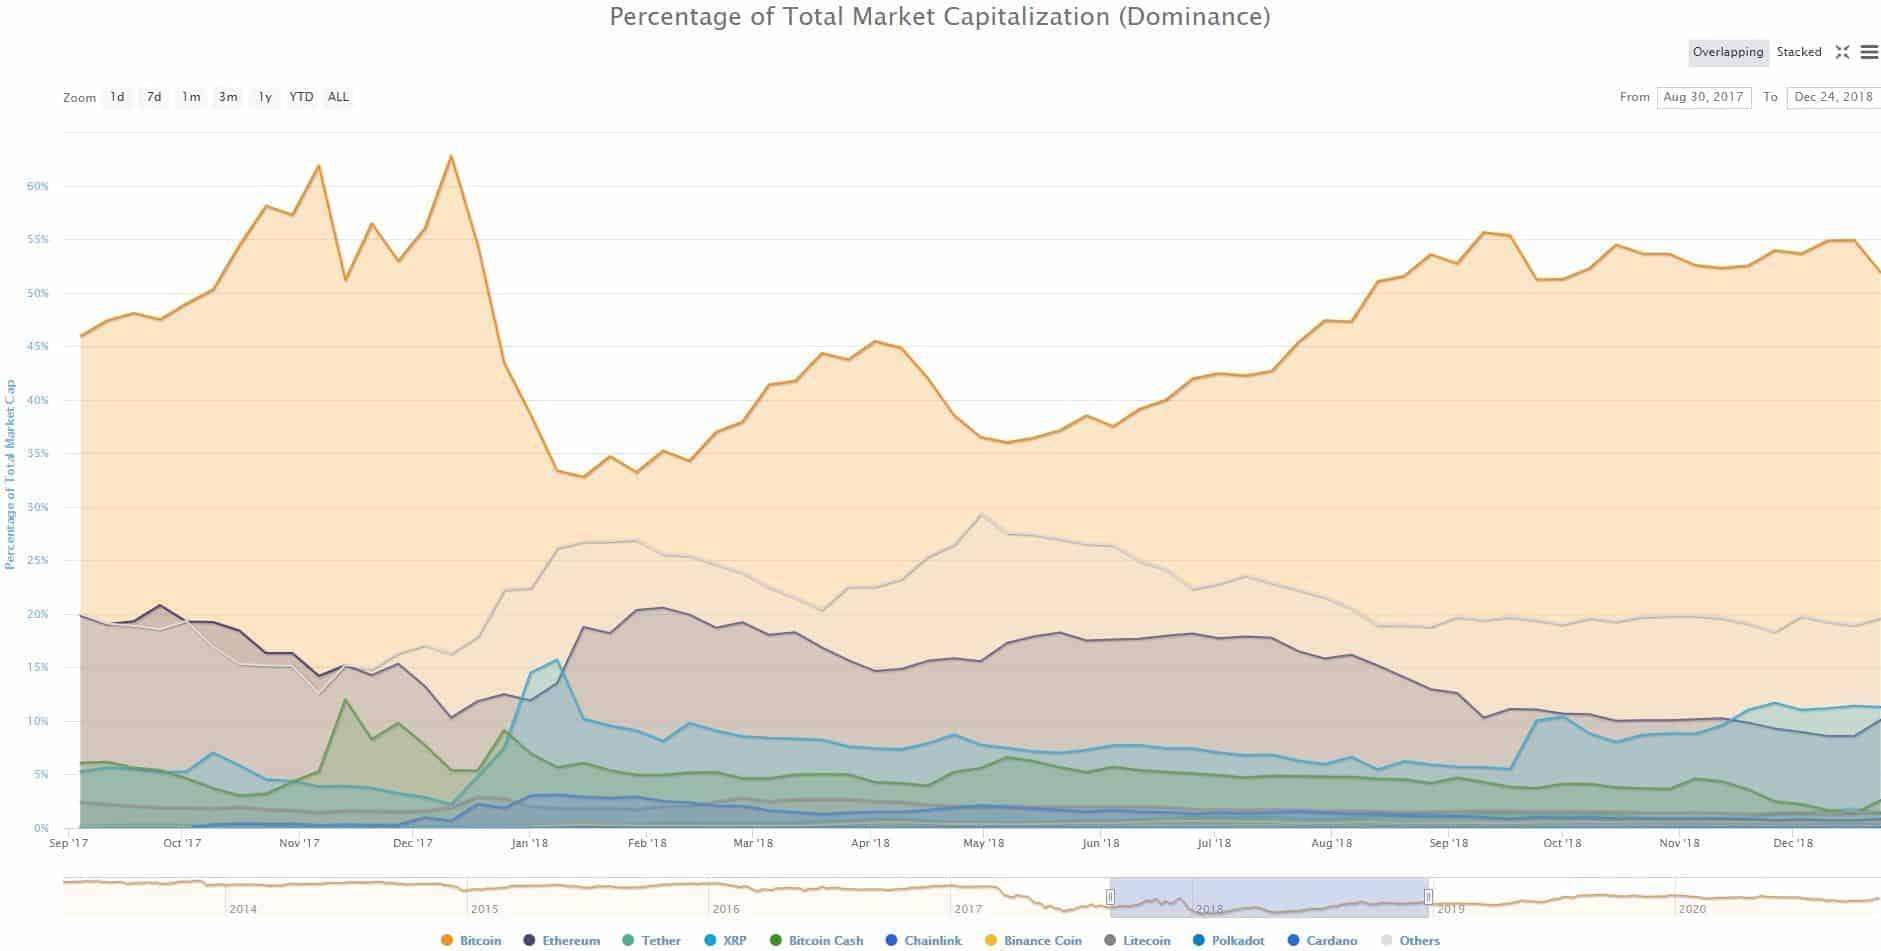 Bitcoins Vs. Altcoins Market Dominance Aug 2017 - Dec 2018. Source: CoinMarketCap